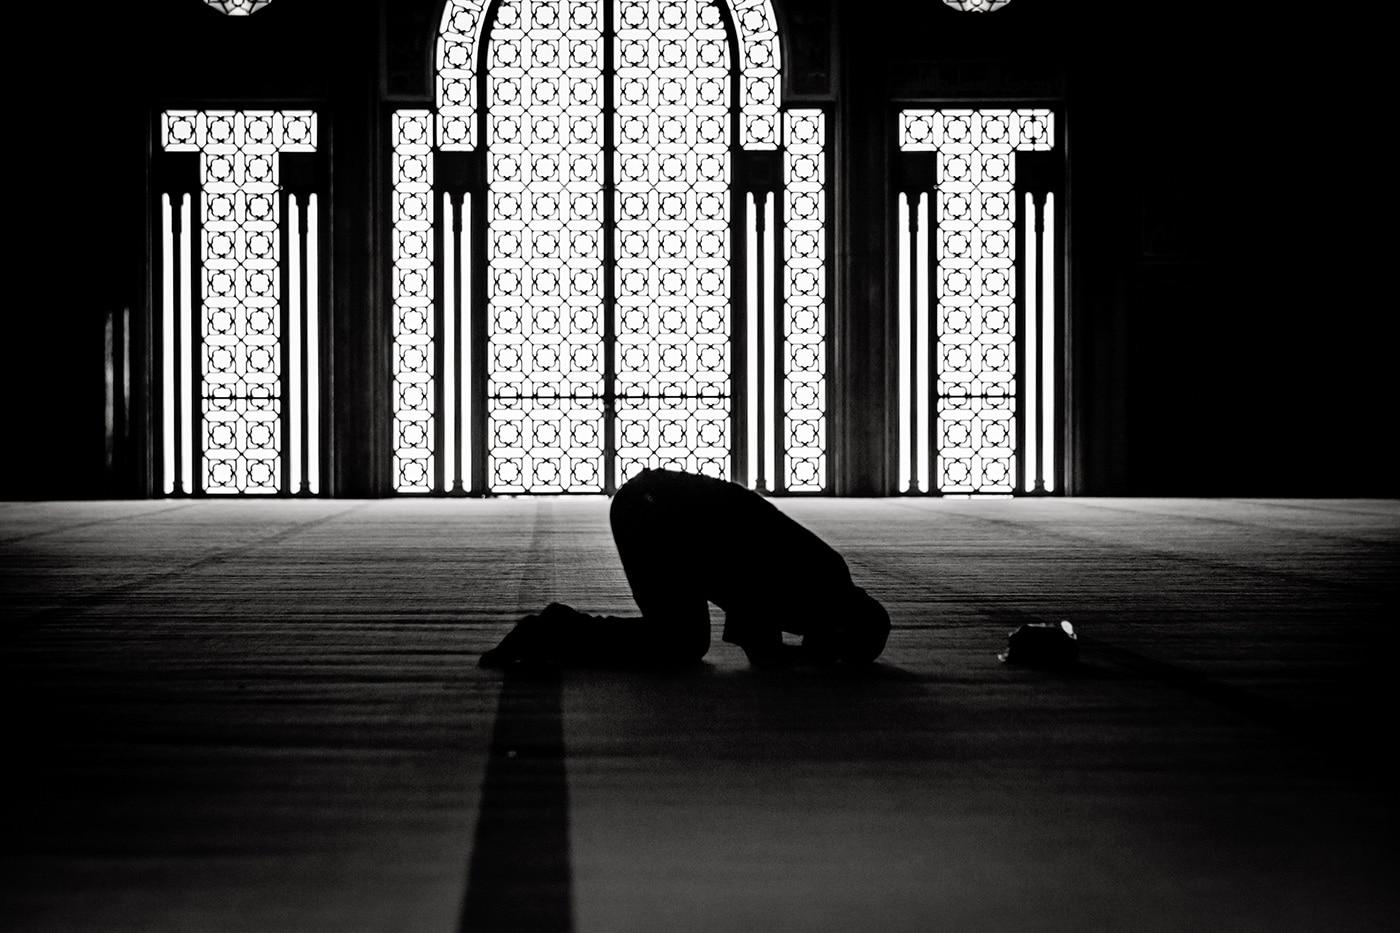 Muslim man praying in the mosque